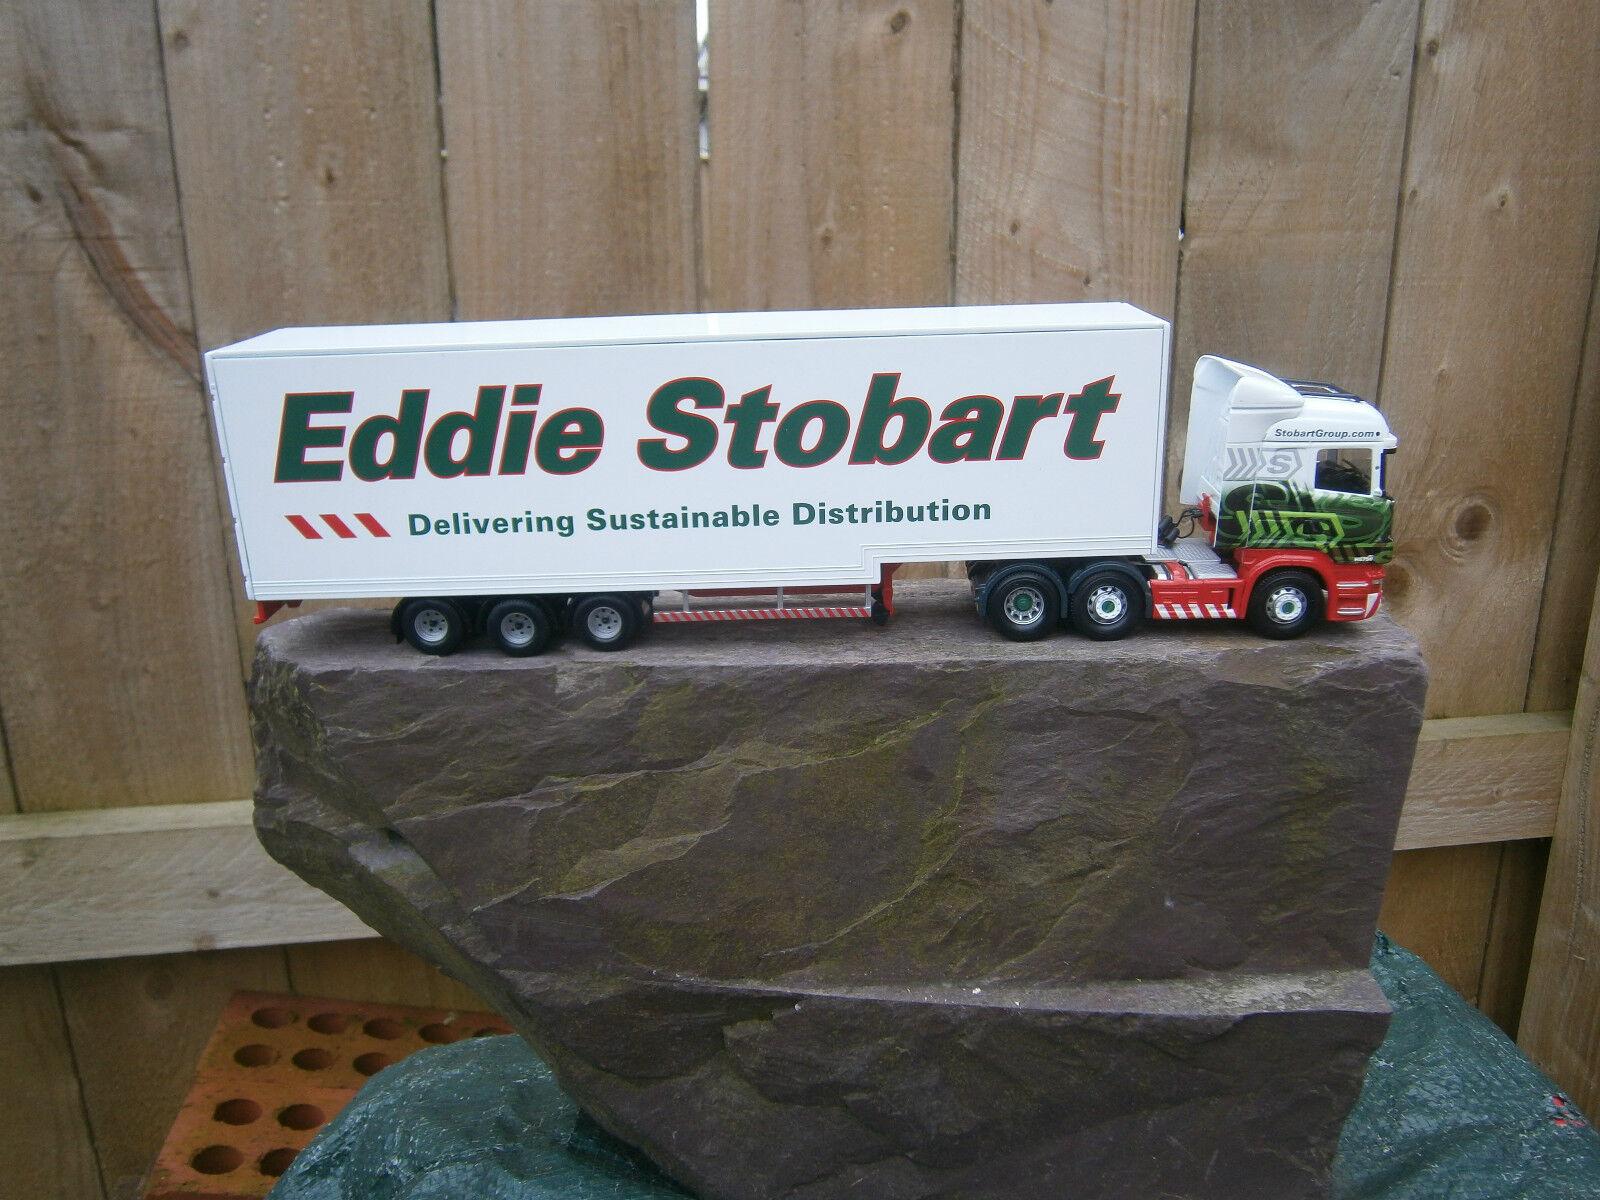 CORGI MODERN camions transport lourd Eddie Stobart transport échelle 1.50